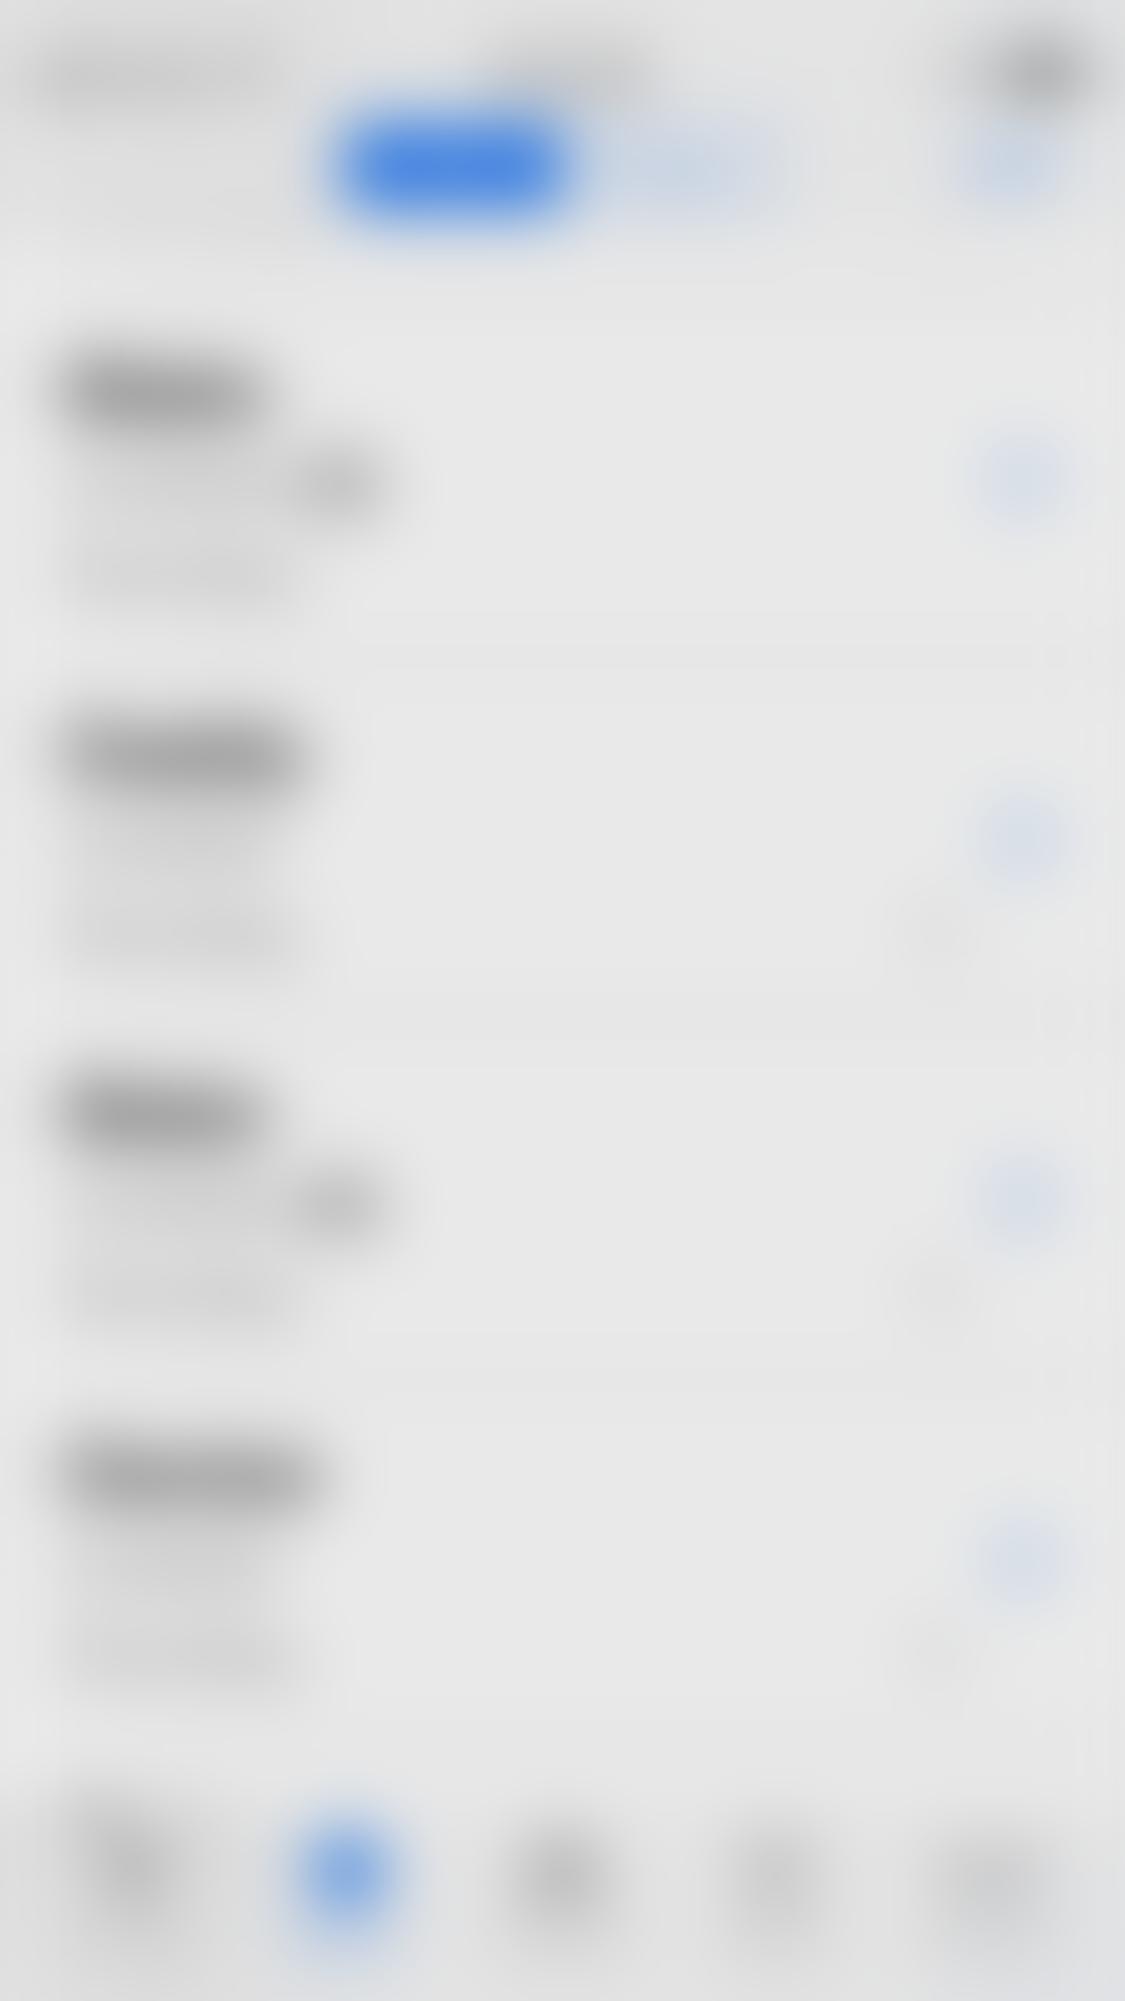 Iphone 8 blurry screen - Apple Community